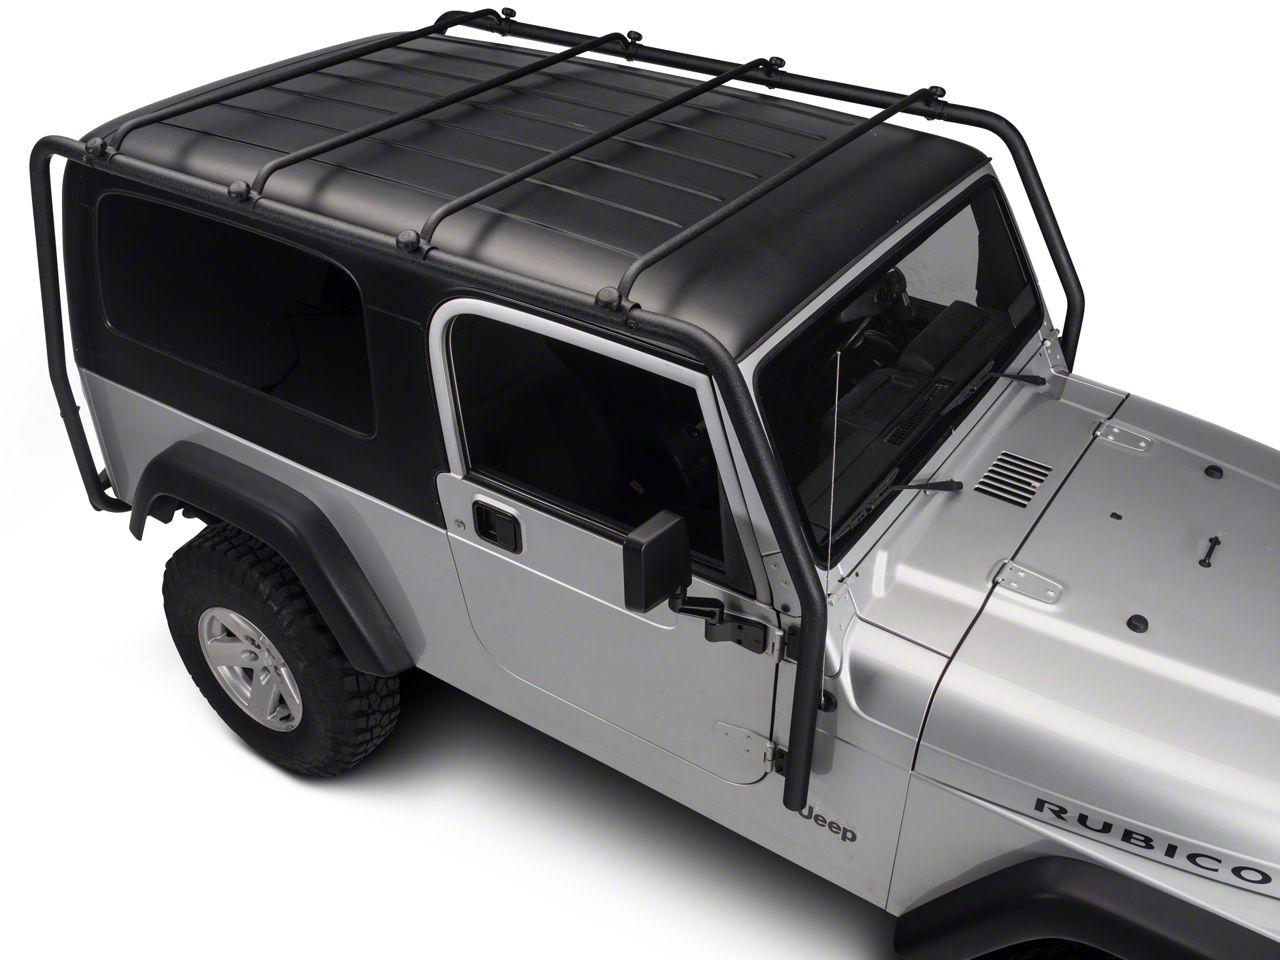 Barricade Jeep Wrangler Roof Rack Textured Black J100532 04 06 Jeep Wrangler Tj Unlimited